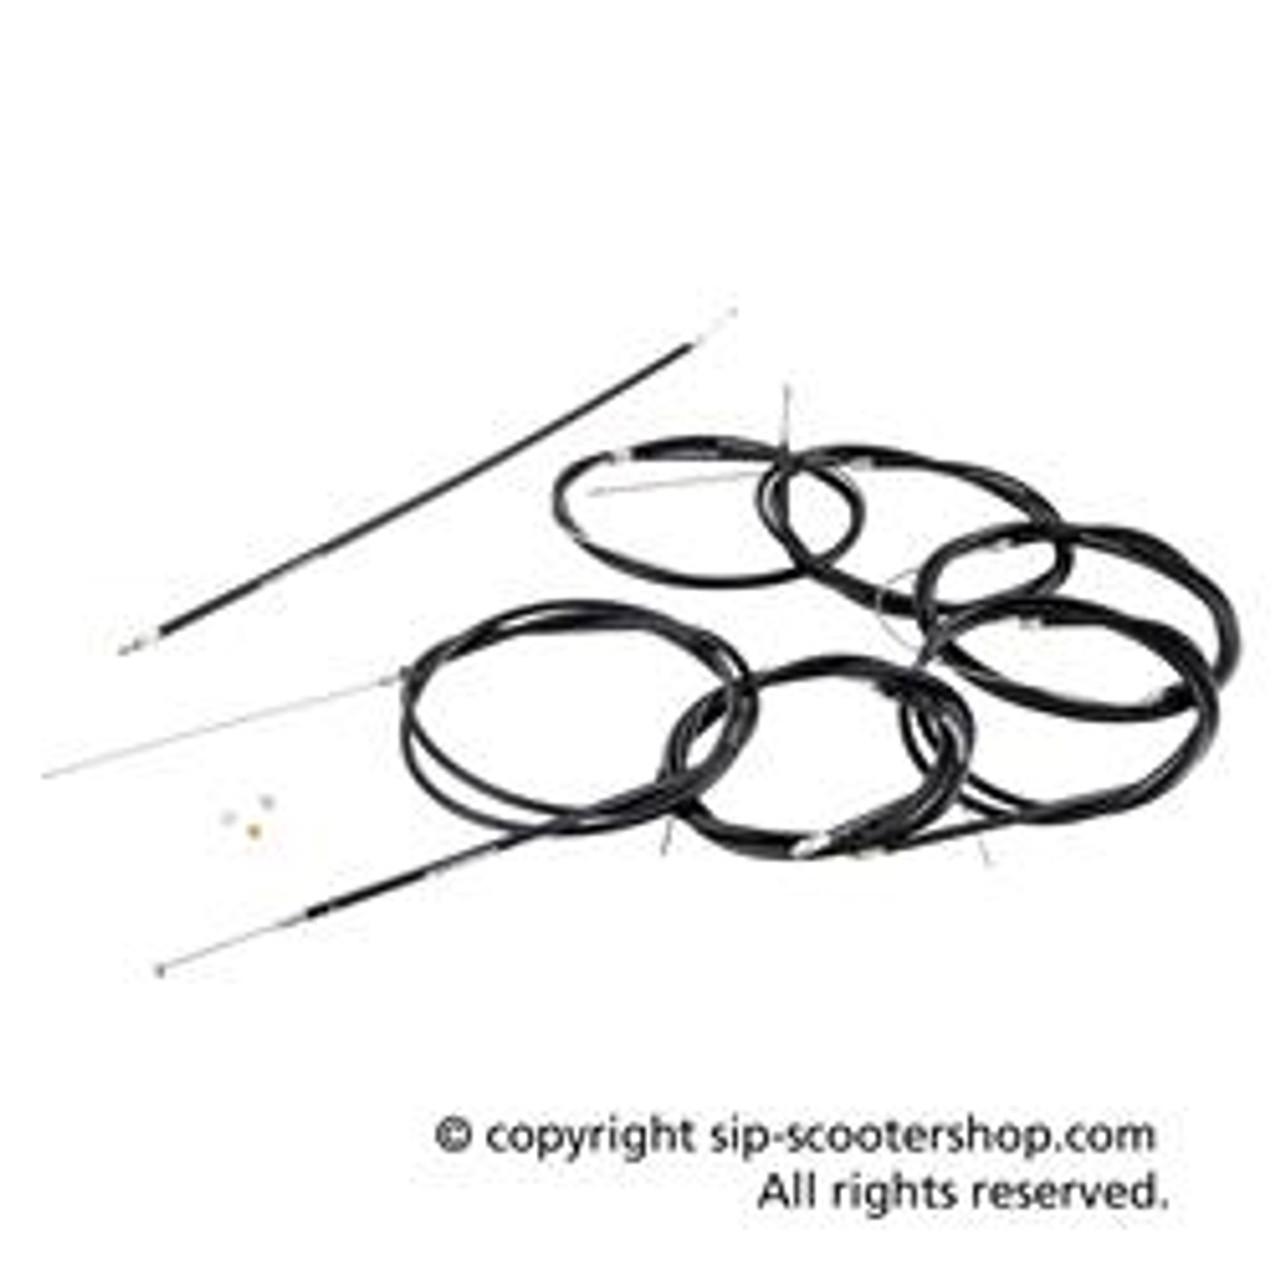 Lambretta Cable Set Complete Torsion-Free SIP Pro - Black (CW-94181400)